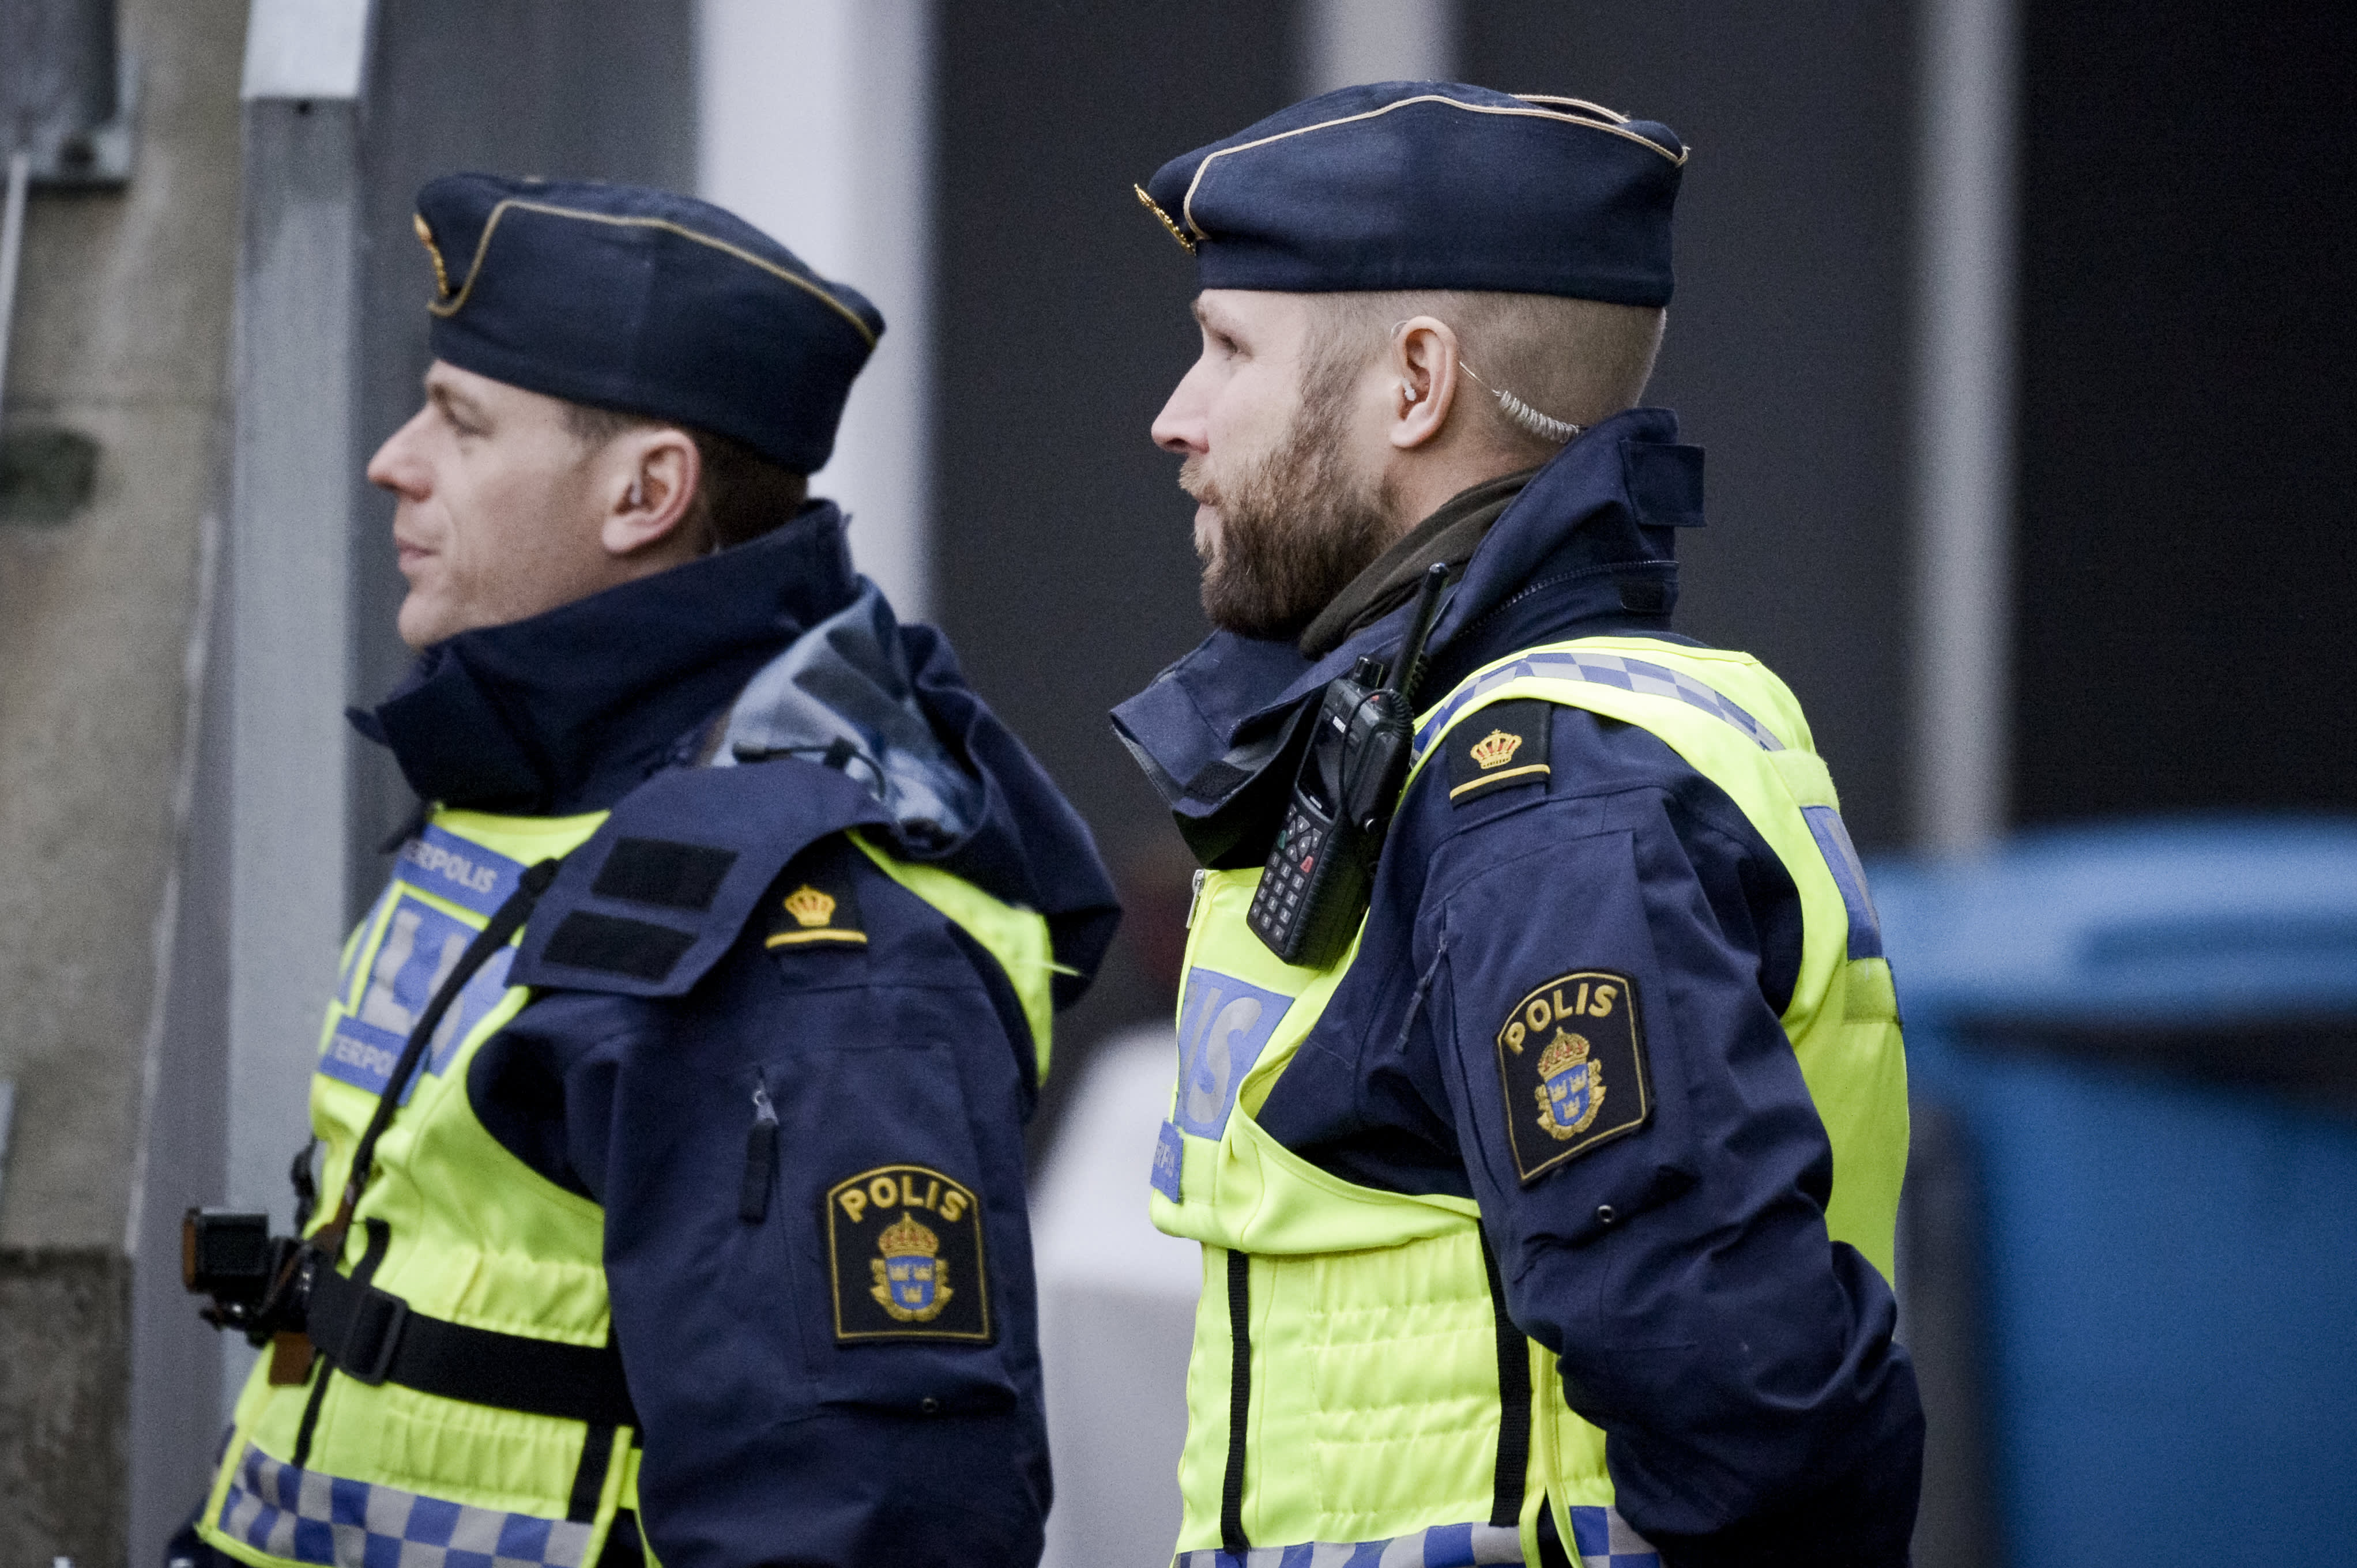 overnight riots in predominately immigrant stockholm suburb